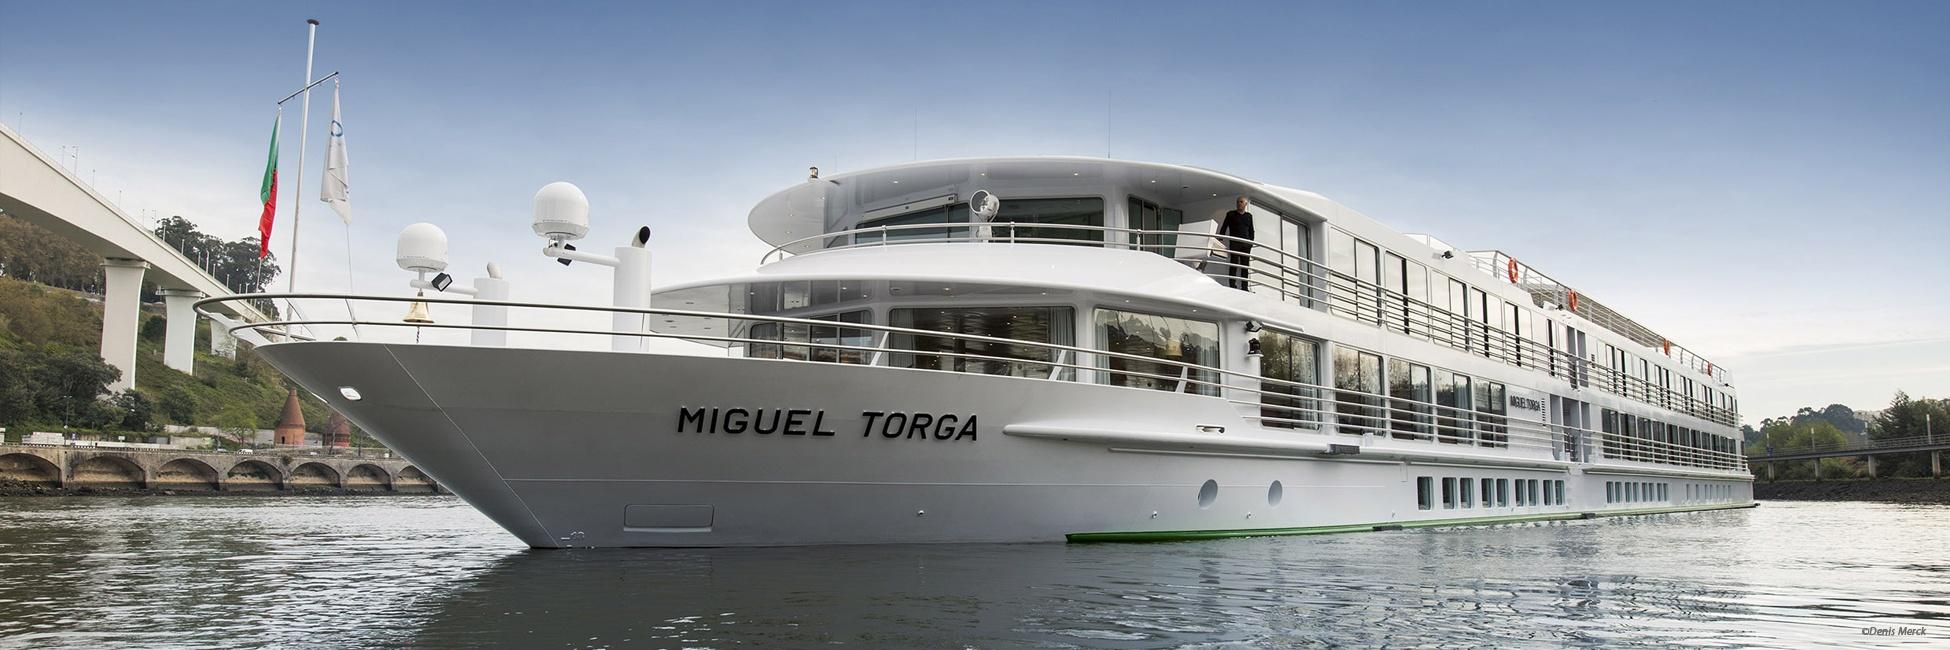 MS Miguel Torga, bateau 5 ancres